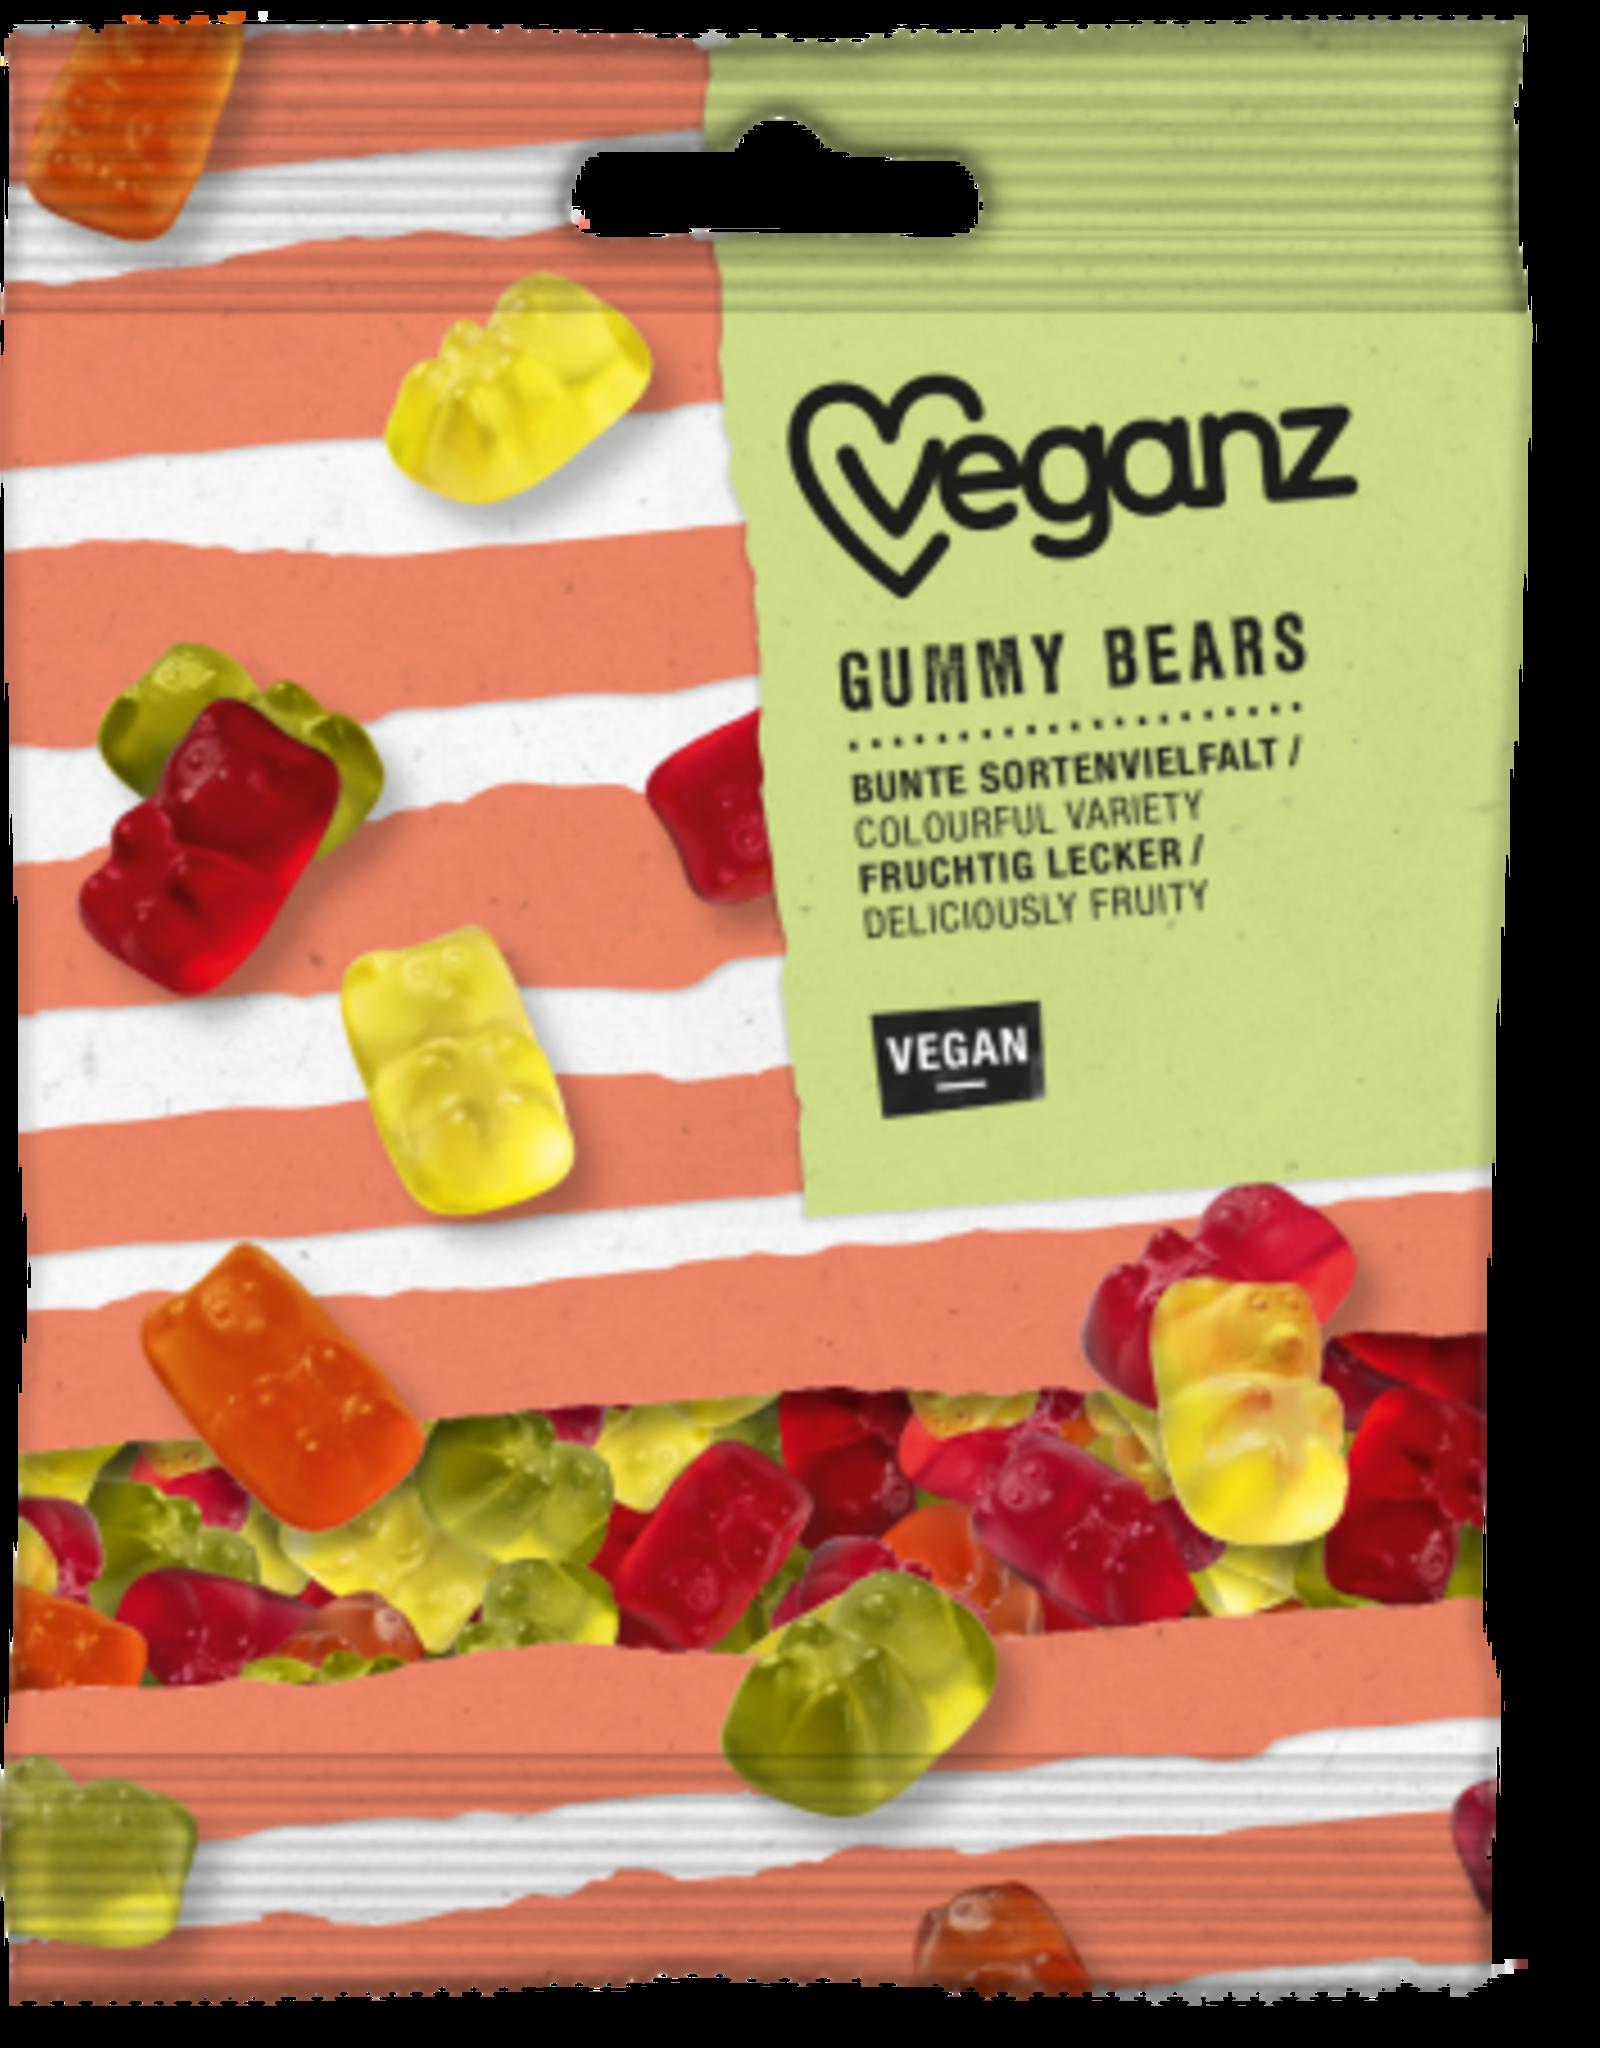 veganz Bonbons Gummy Bears - Veganz 100g